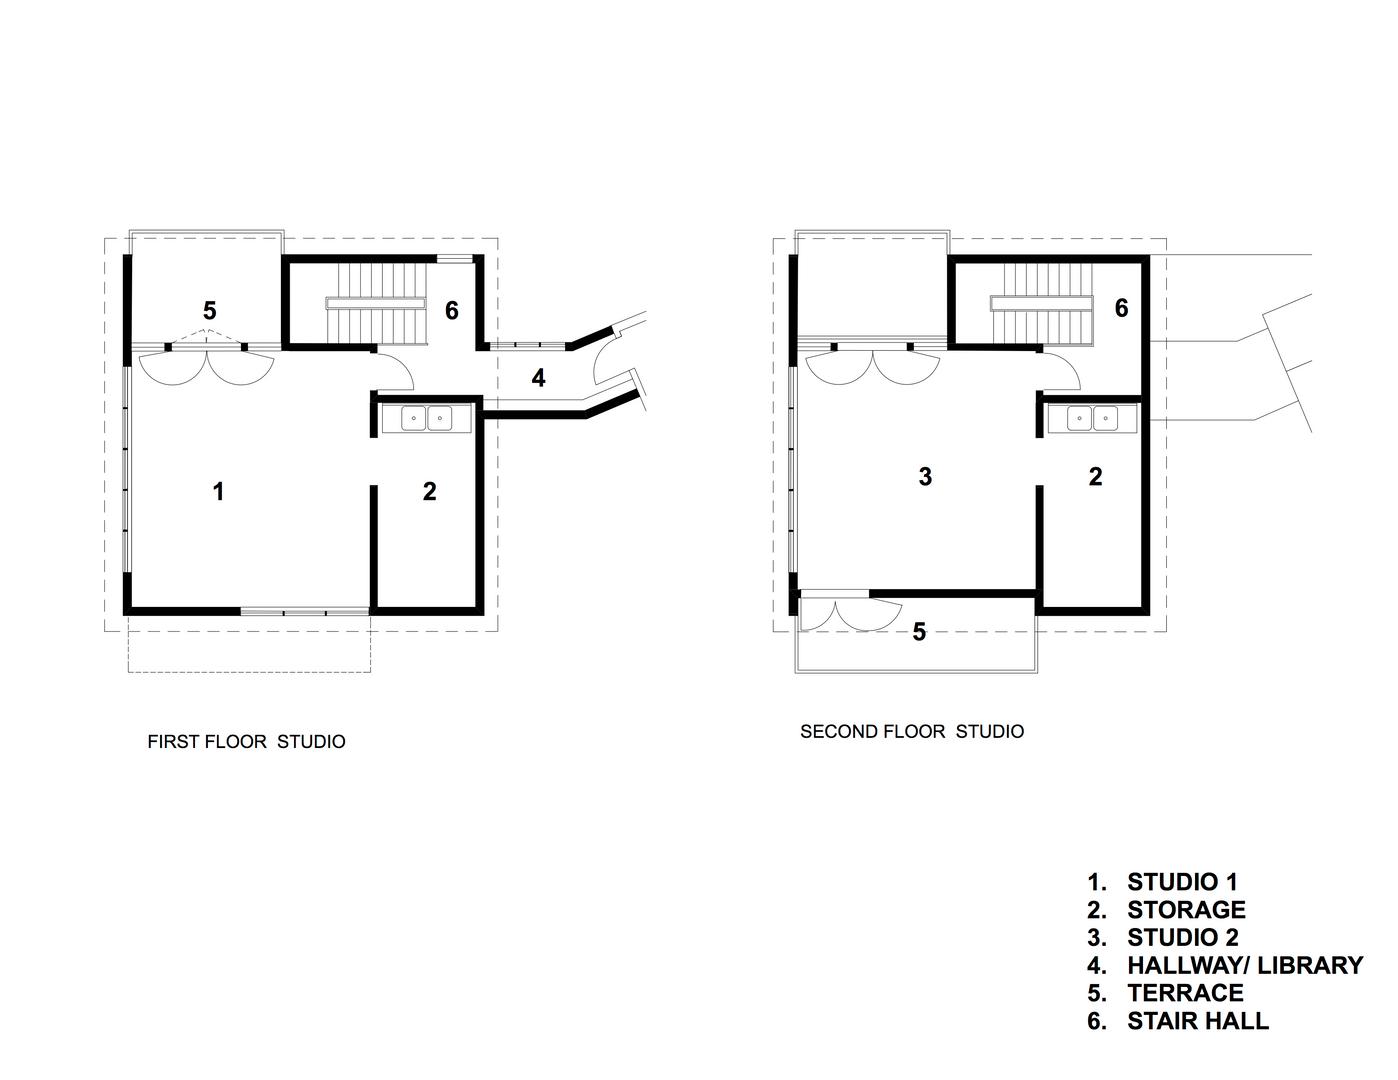 04 CATSKILLS ART STUDIO.png